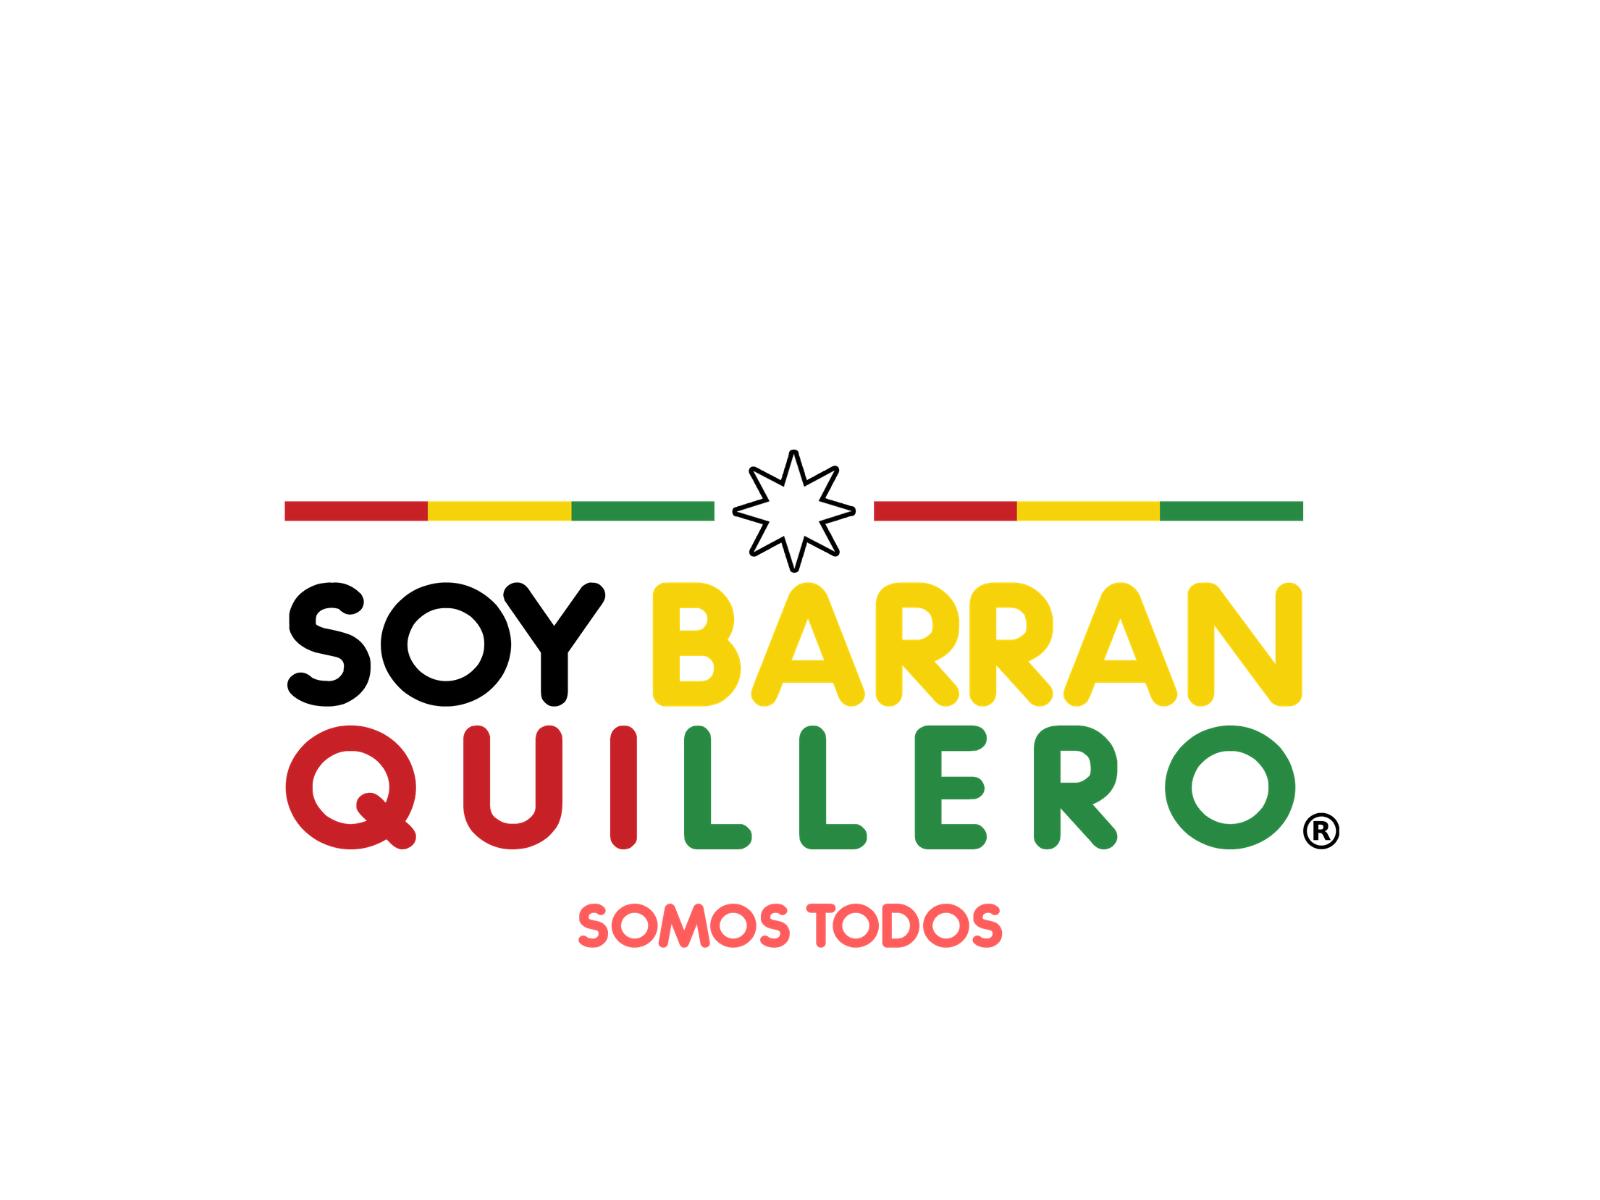 Soy Barranquillero